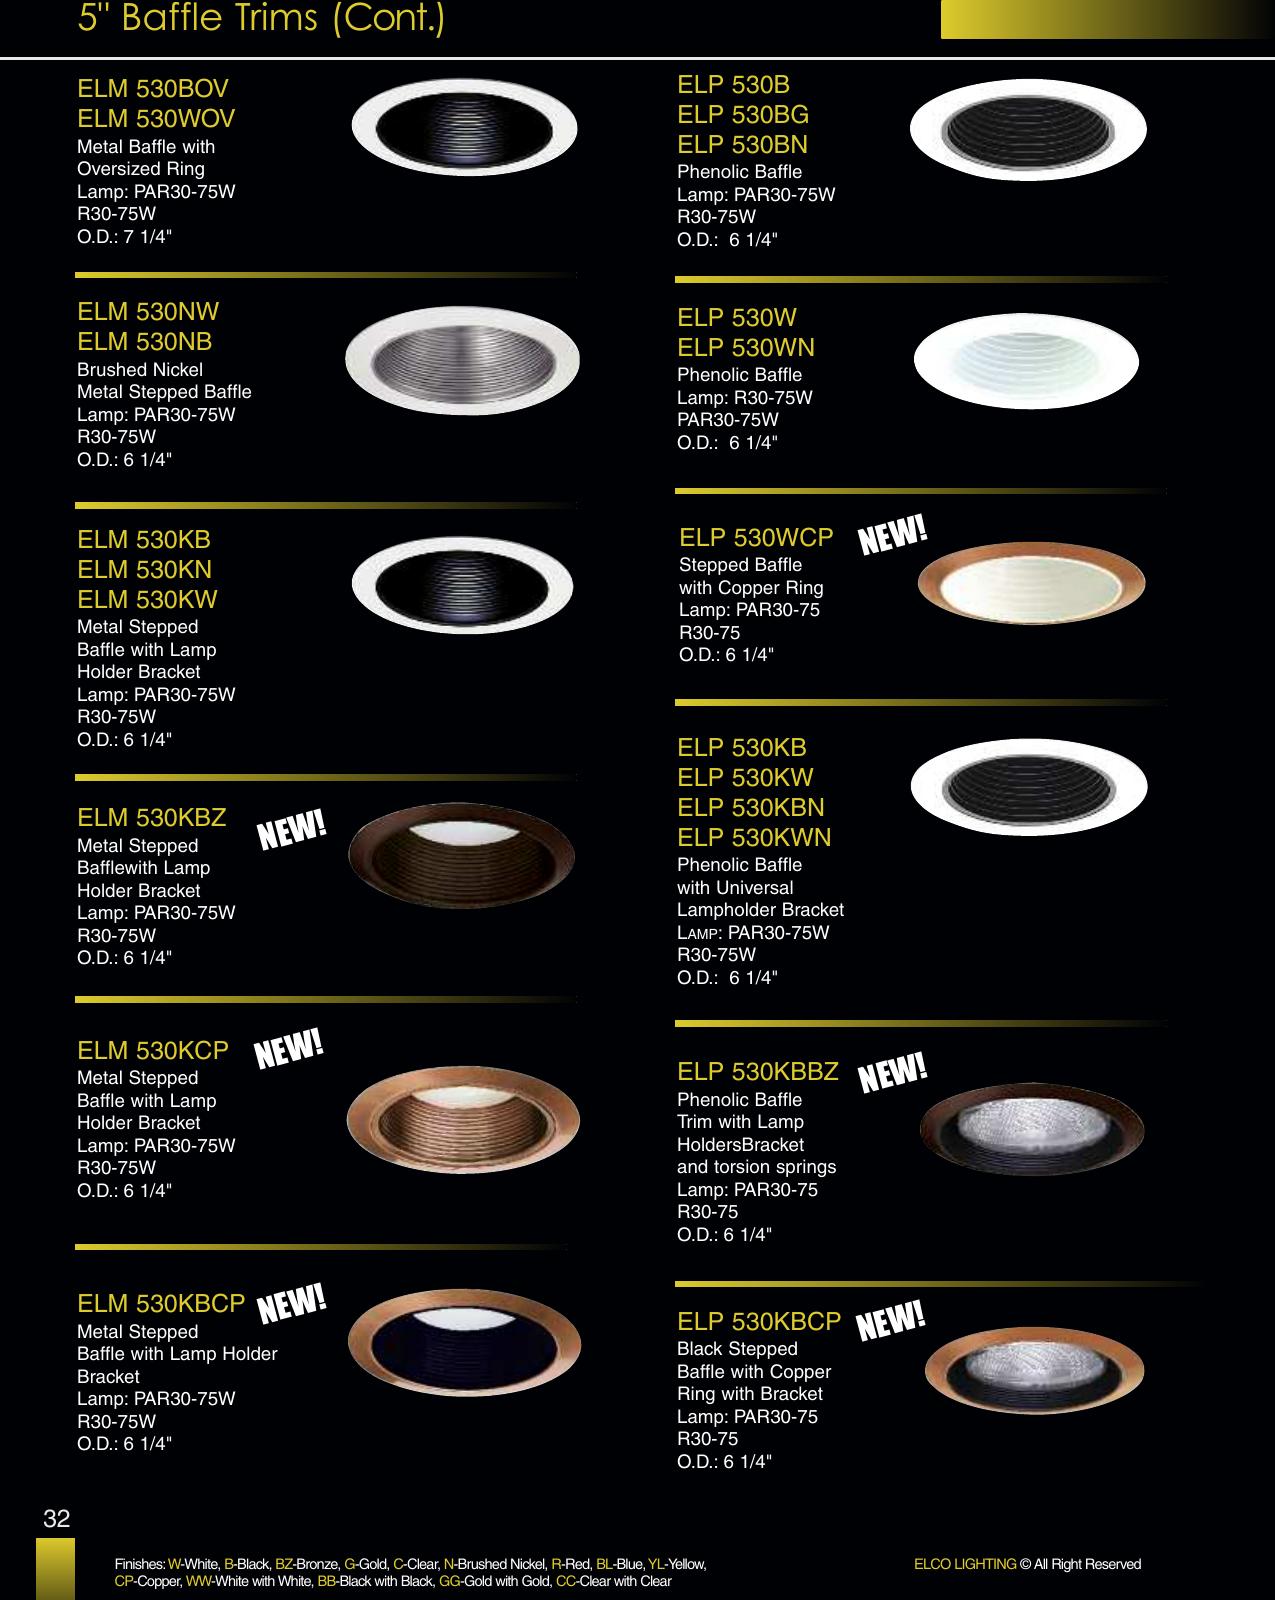 Elco Lighting EL 2517WW 6 LV EYEBALL ALL WHITE